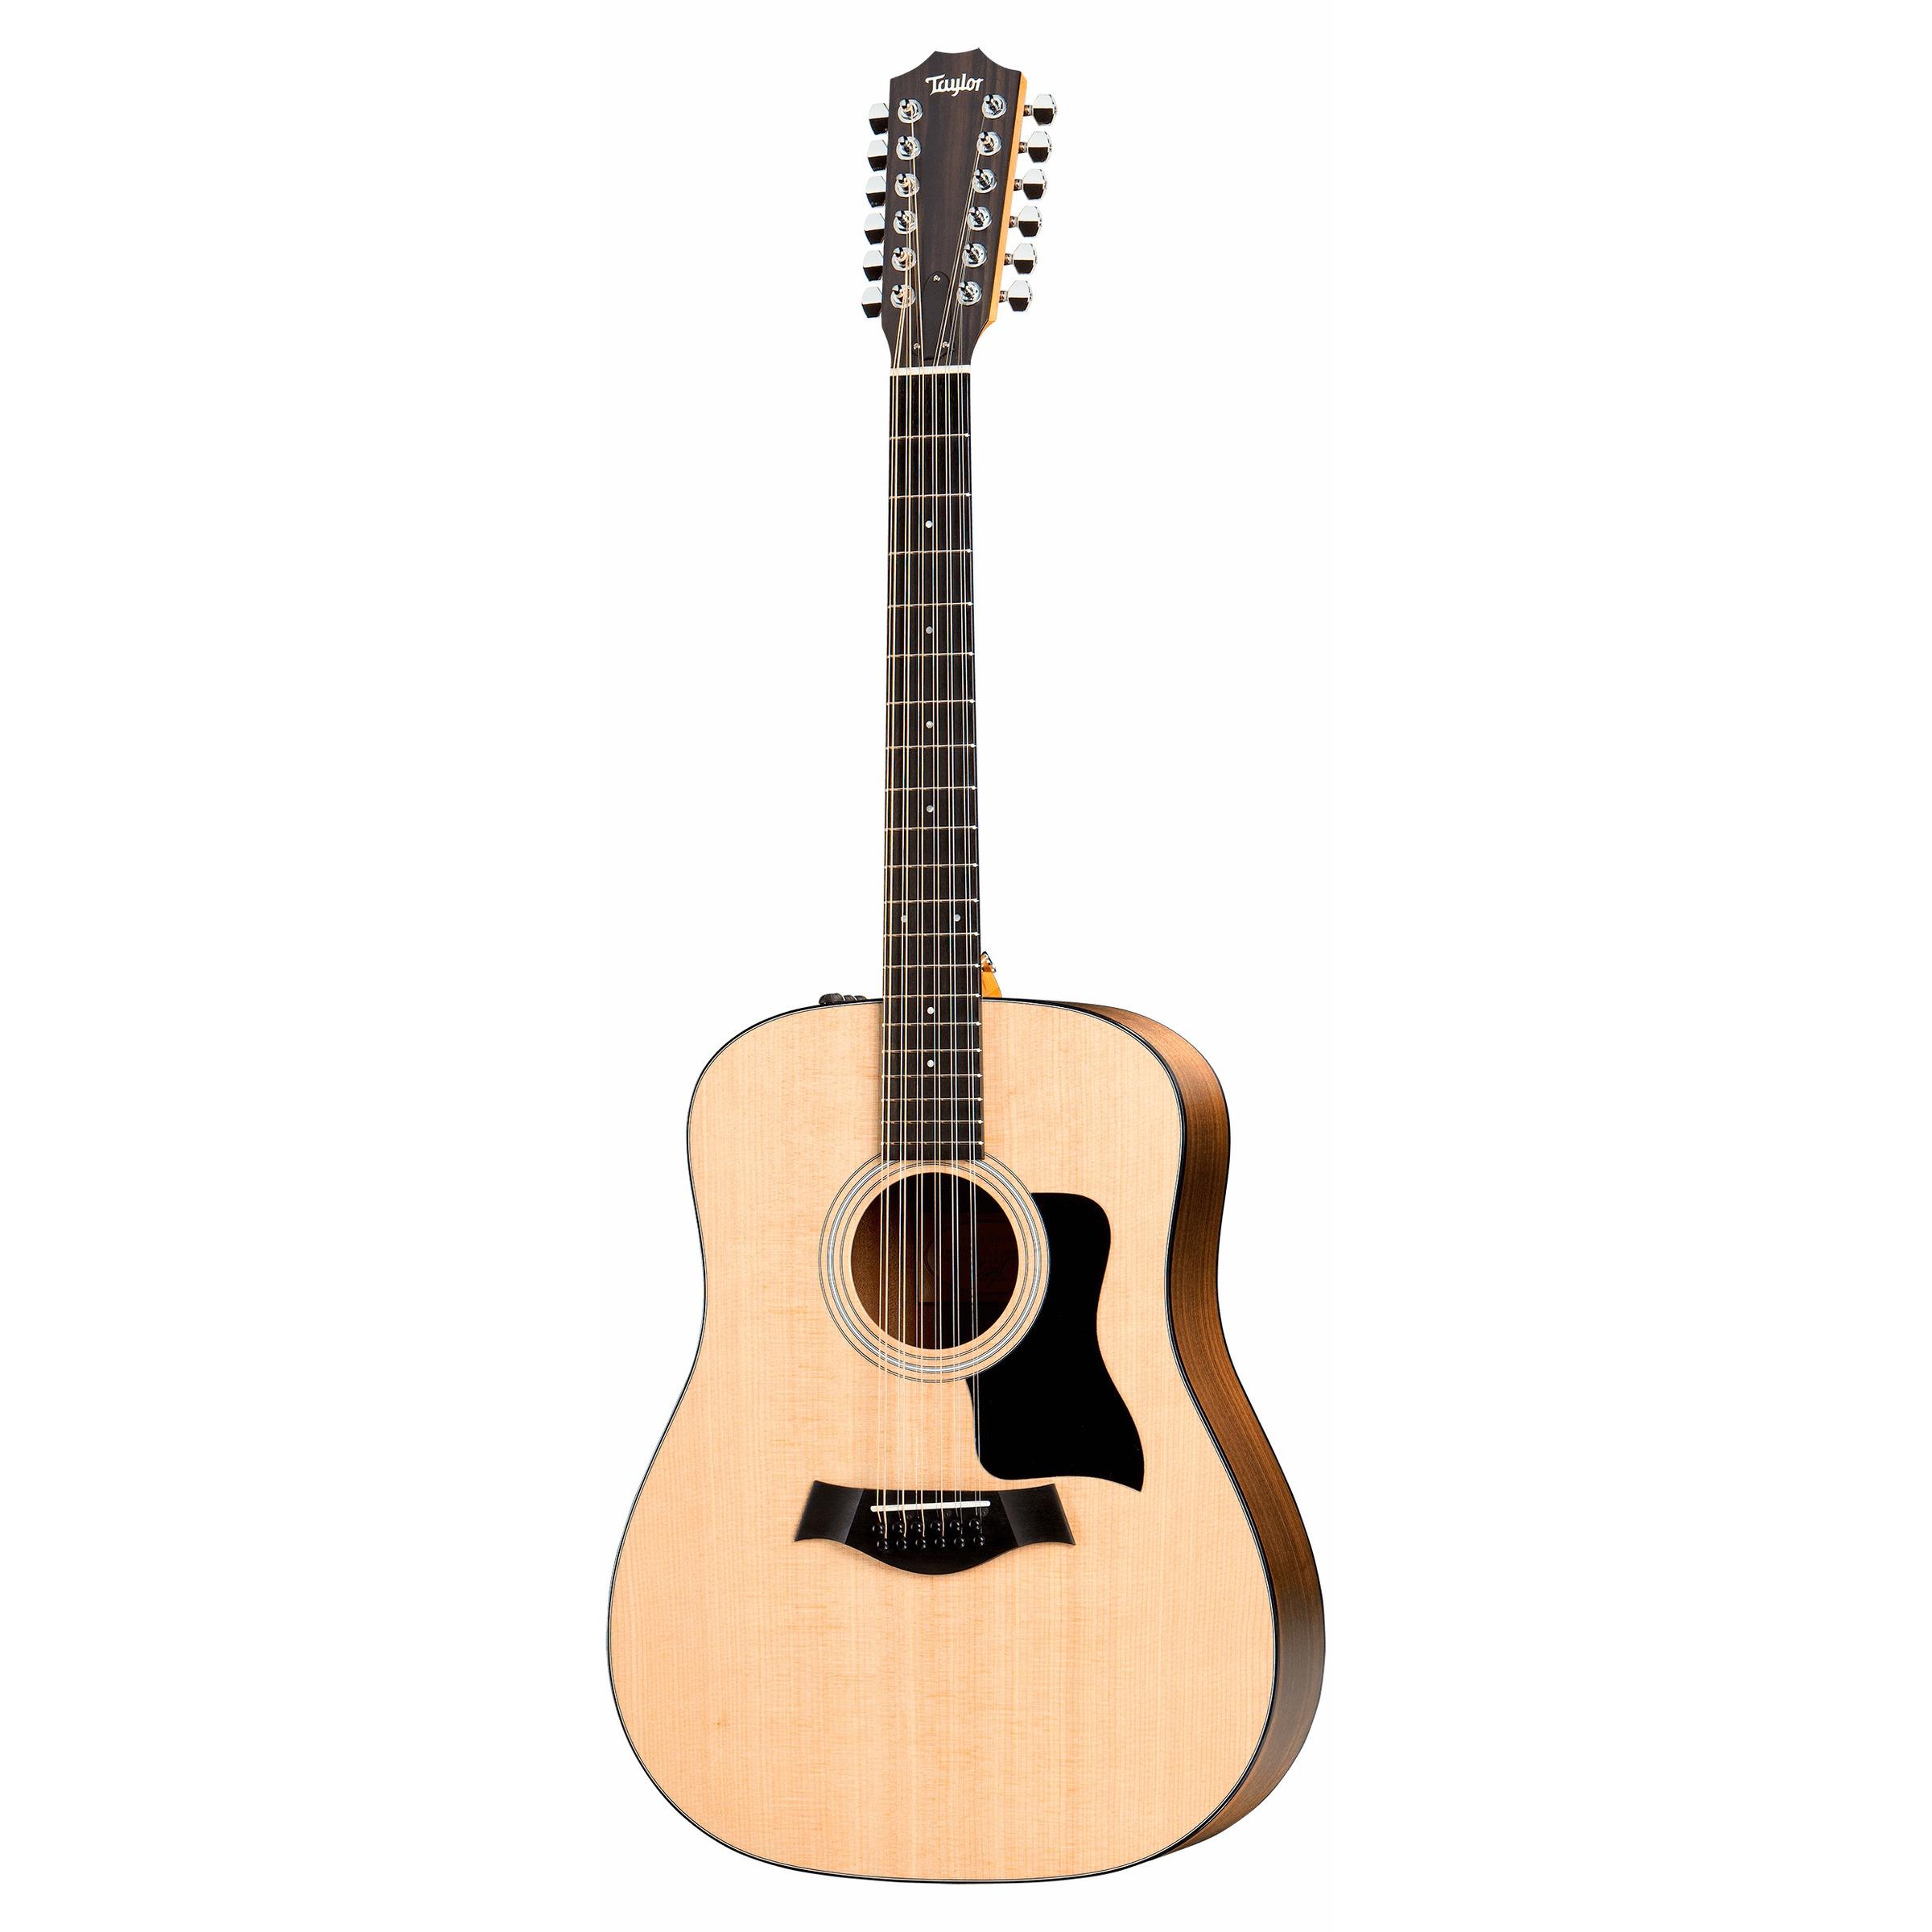 taylor 150e 12 string electro acoustic guitar giggear. Black Bedroom Furniture Sets. Home Design Ideas